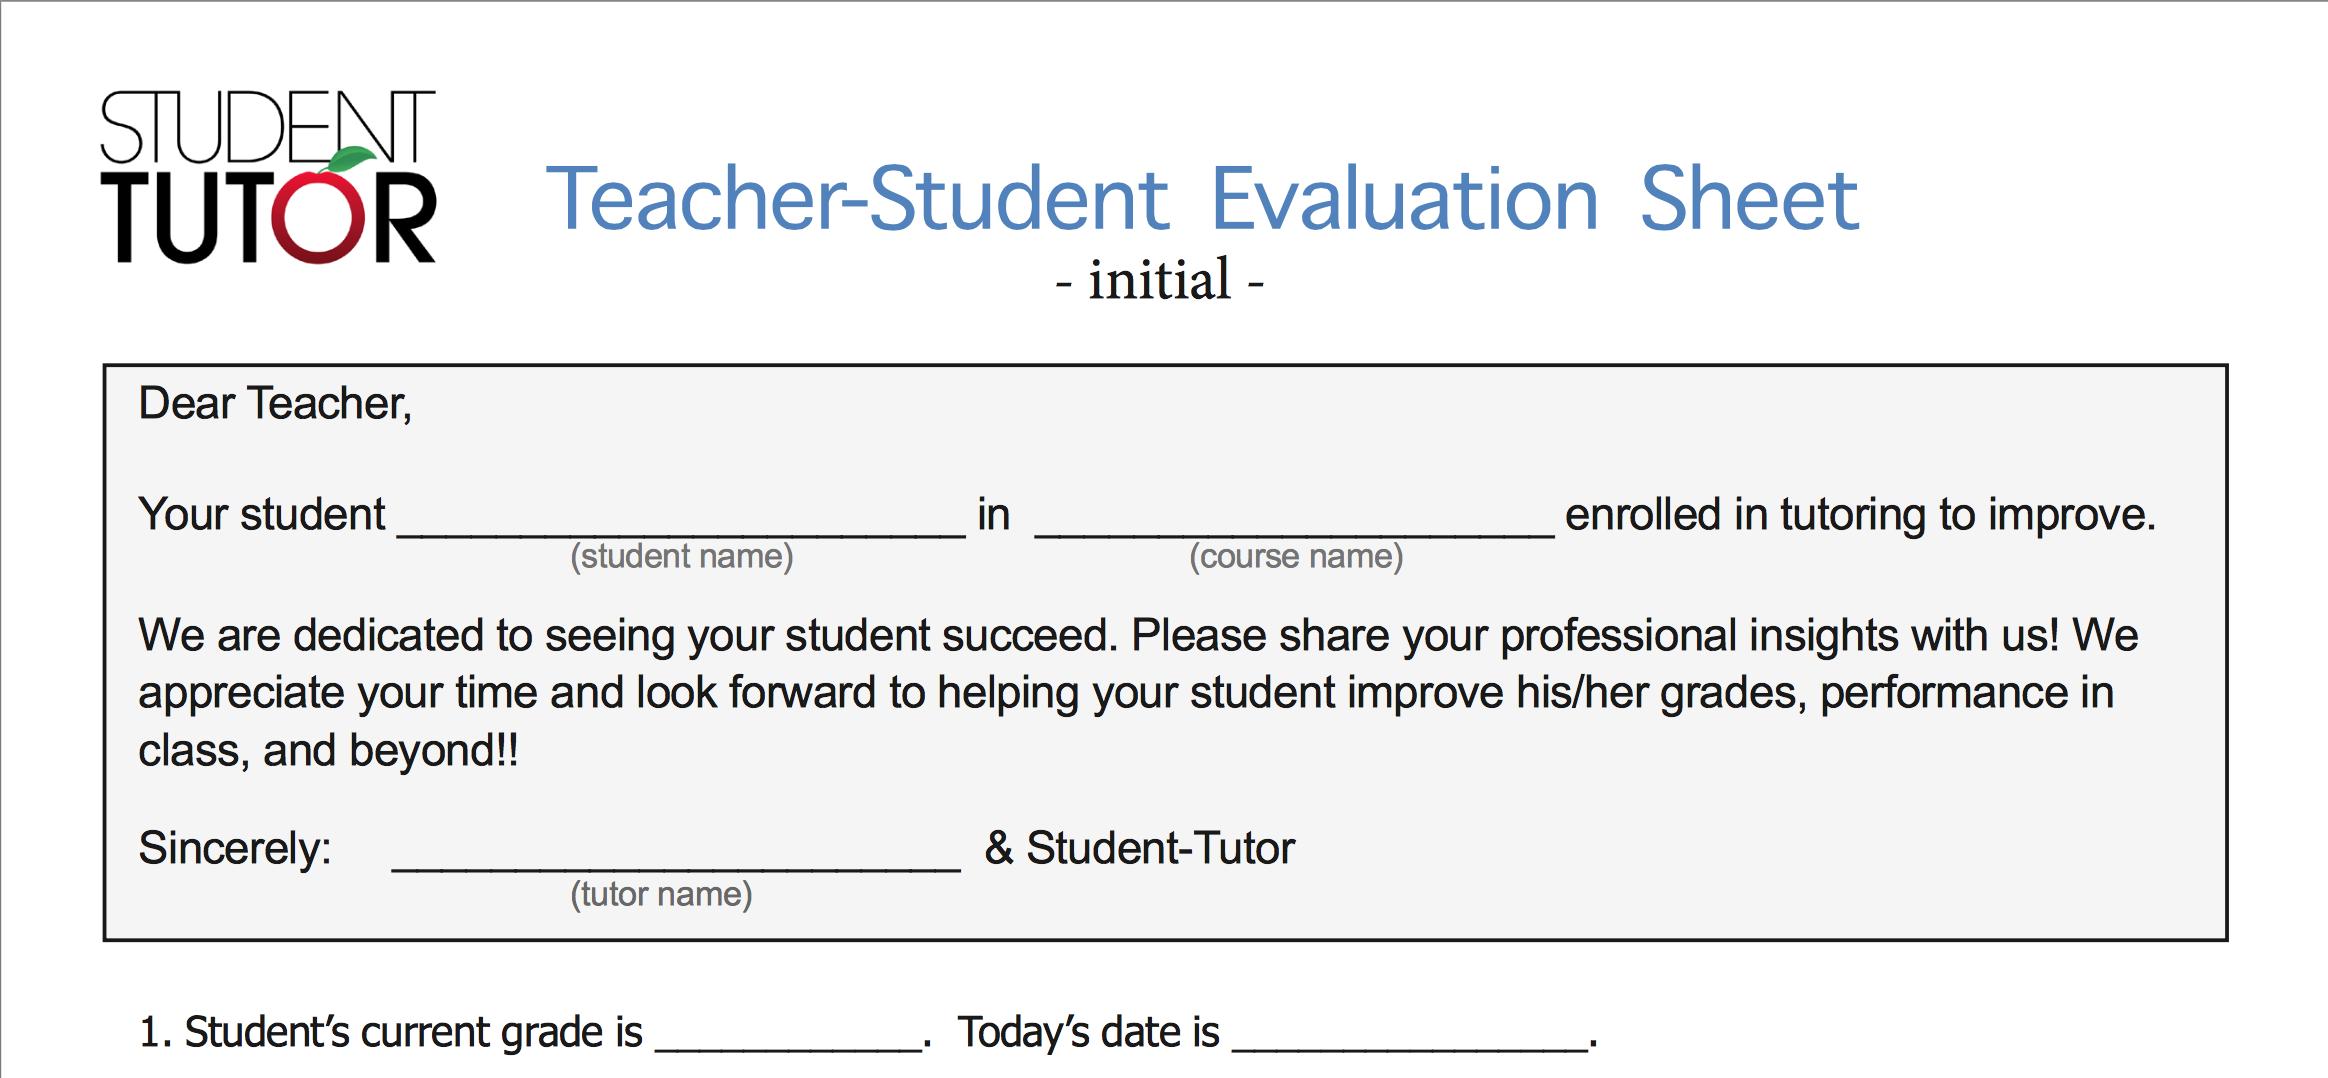 Seek help from teacher to raise GPA